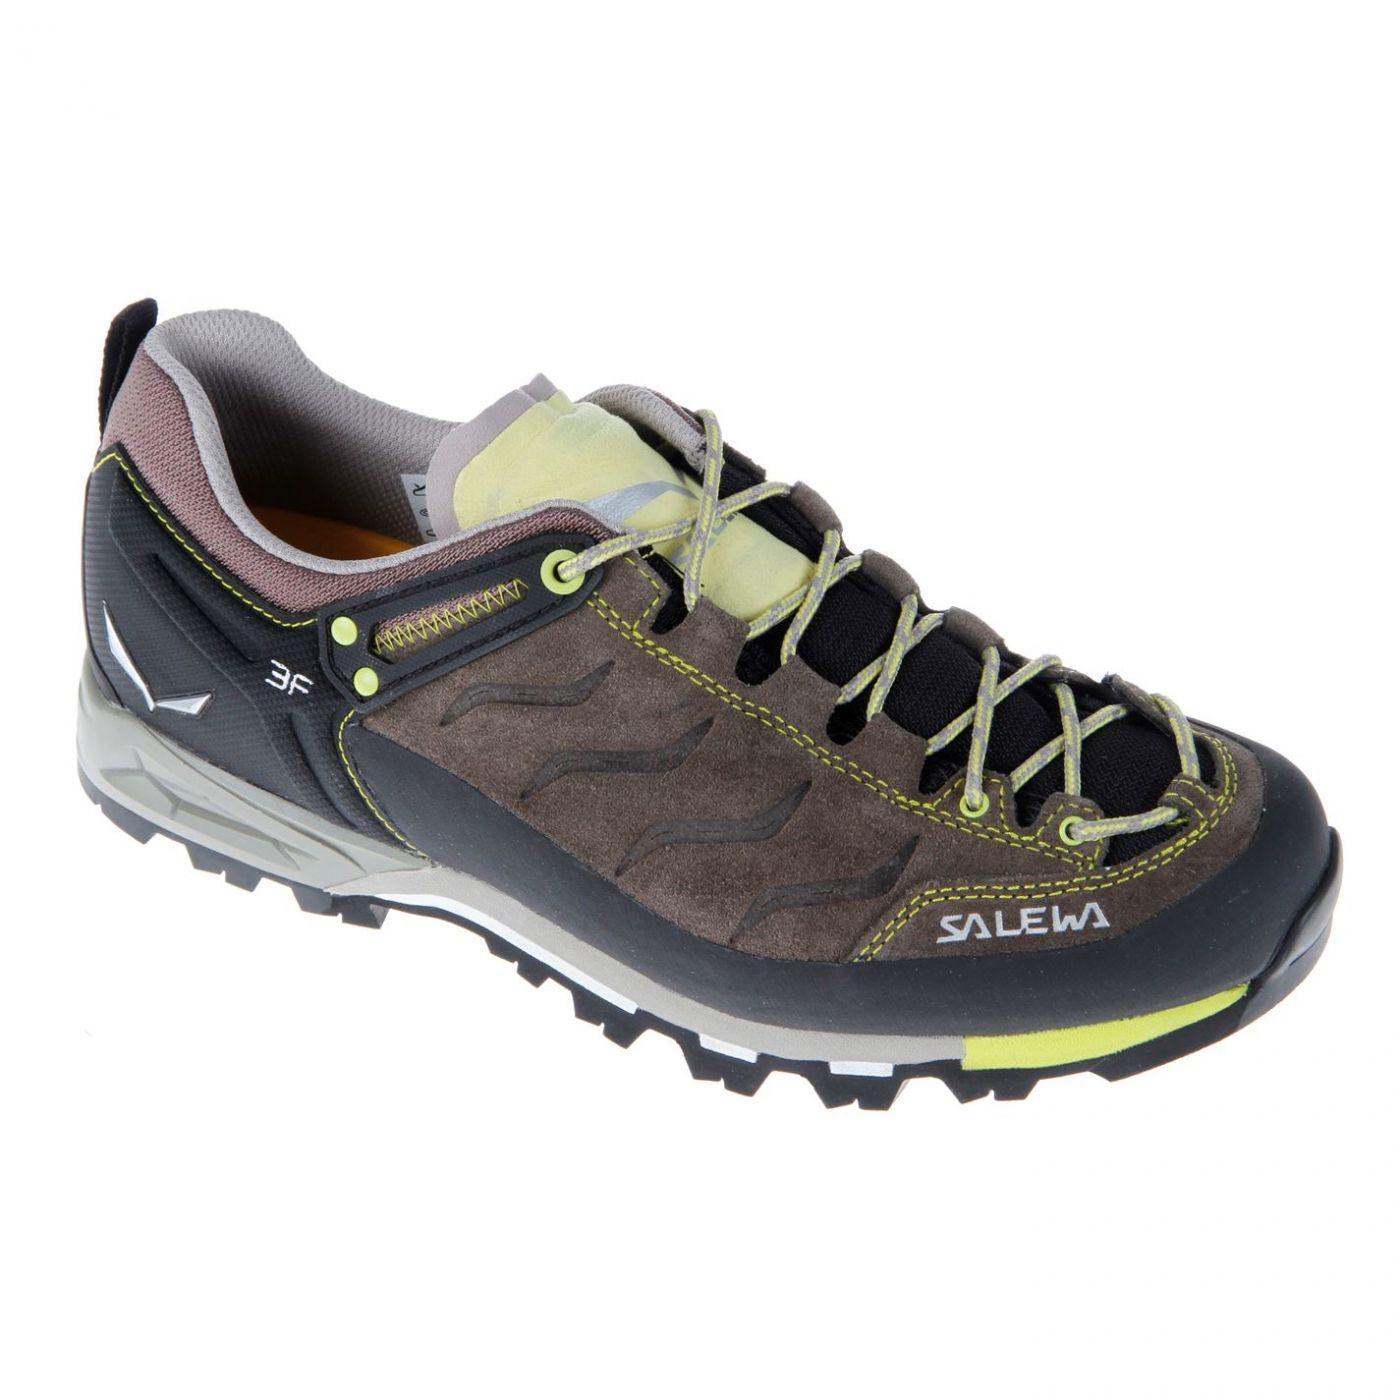 Salewa Mountain Trainer Ladies Walking Shoes